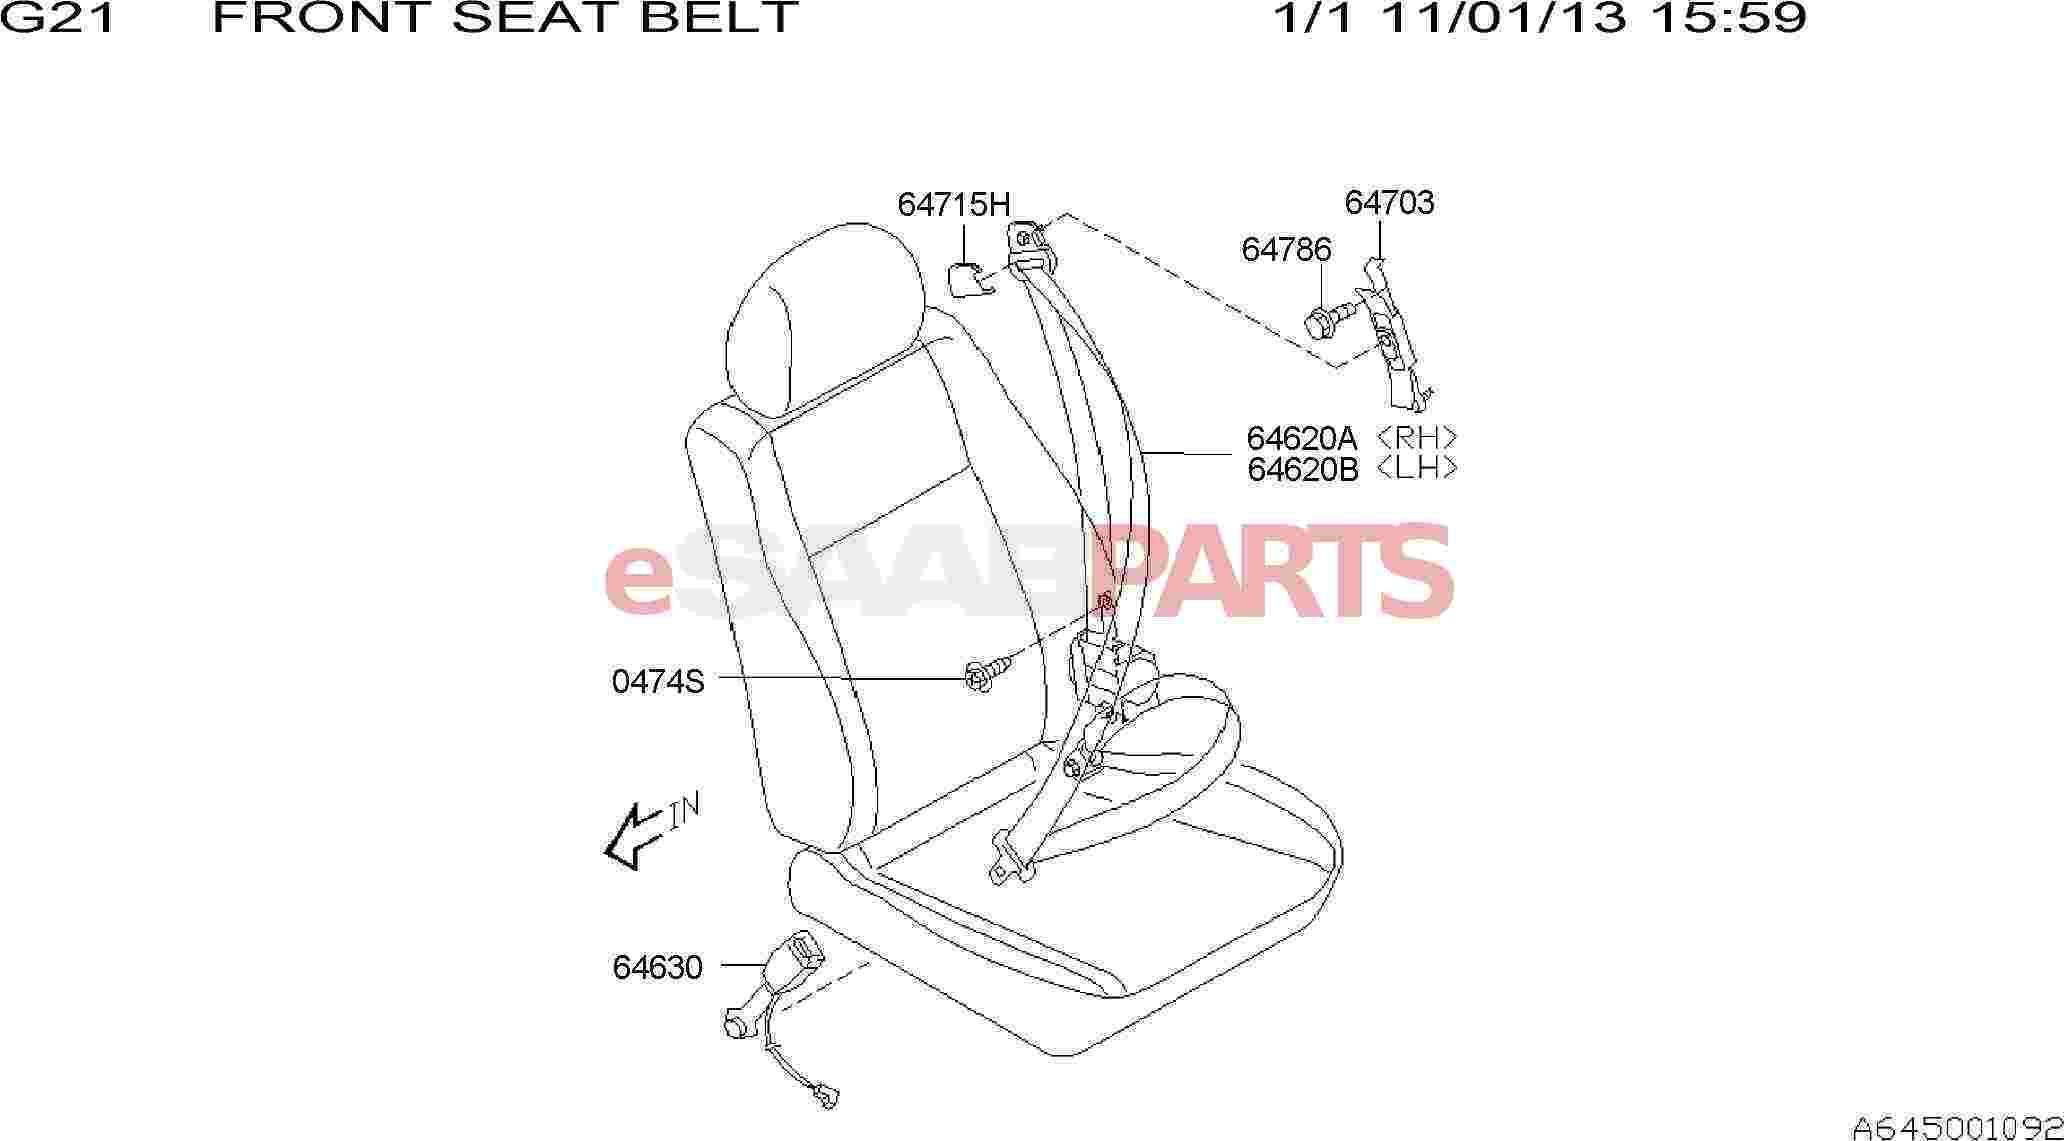 P 0900c152800add0b in addition 2013 Hyundai Genesis Coupe Parts Diagrams further Baja 110 Atv Wiring Diagram further John Deere 435 Baler Parts List additionally Index. on seat belt mechanism diagram